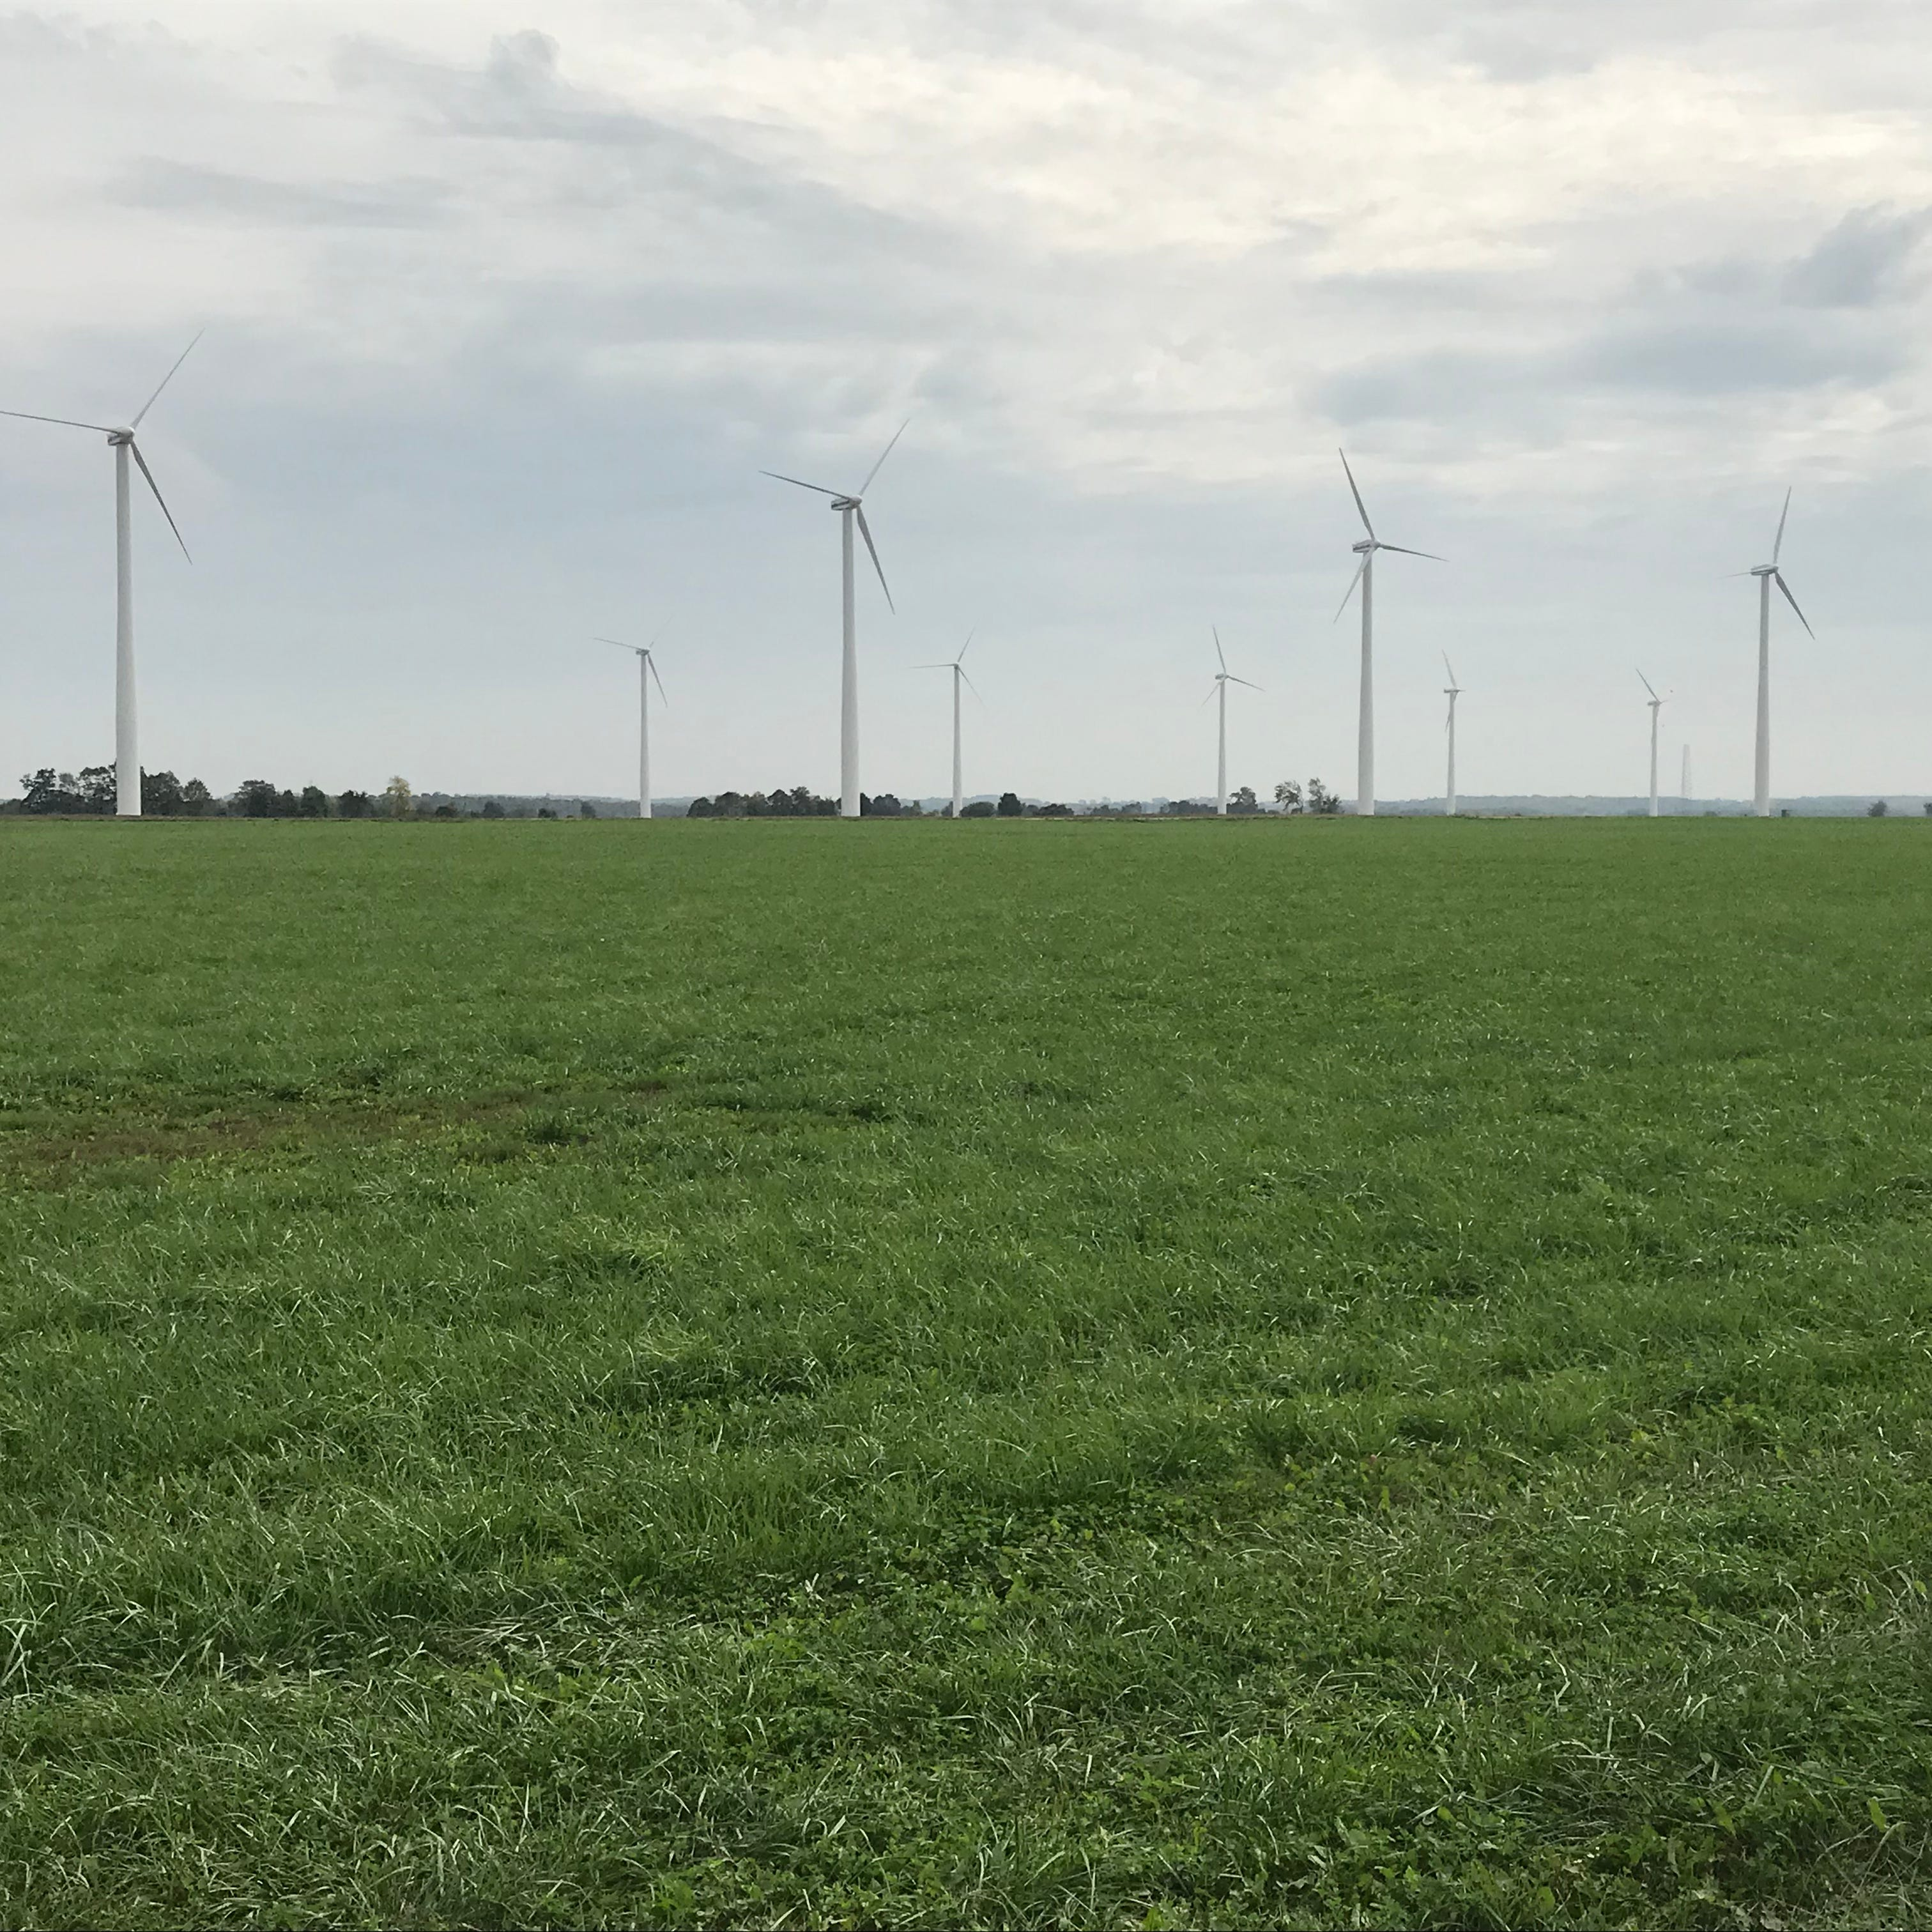 Wisconsin Public Service closing Kewaunee County wind energy farm